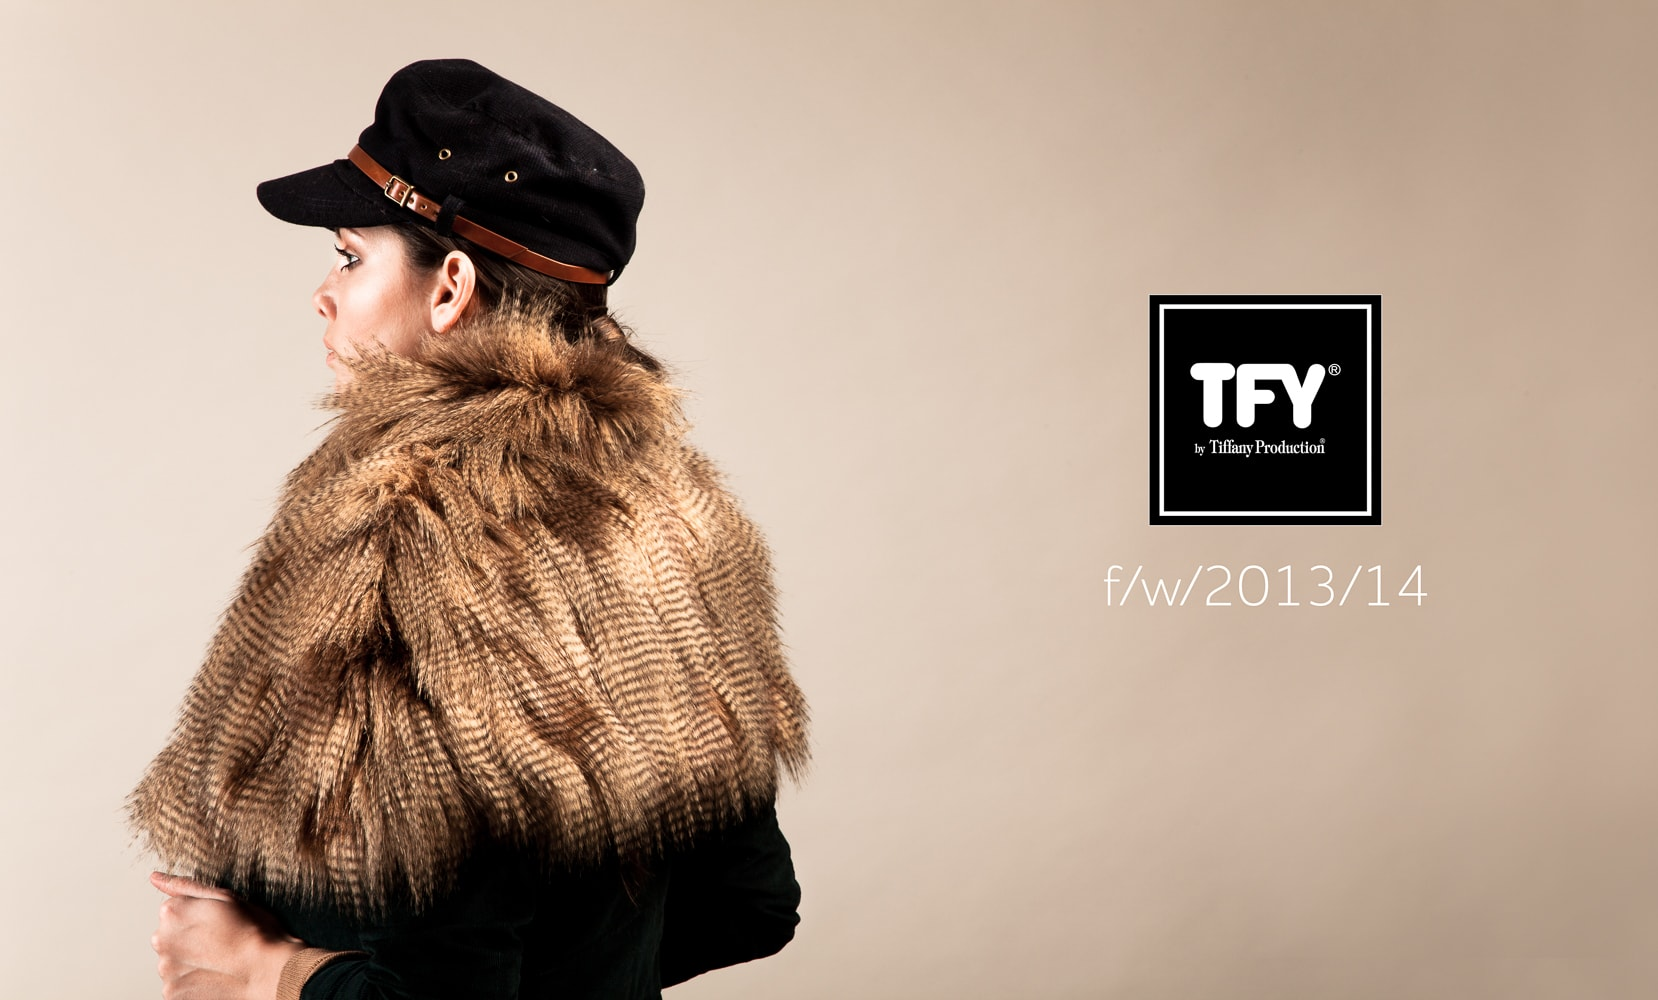 TFY FW13/14